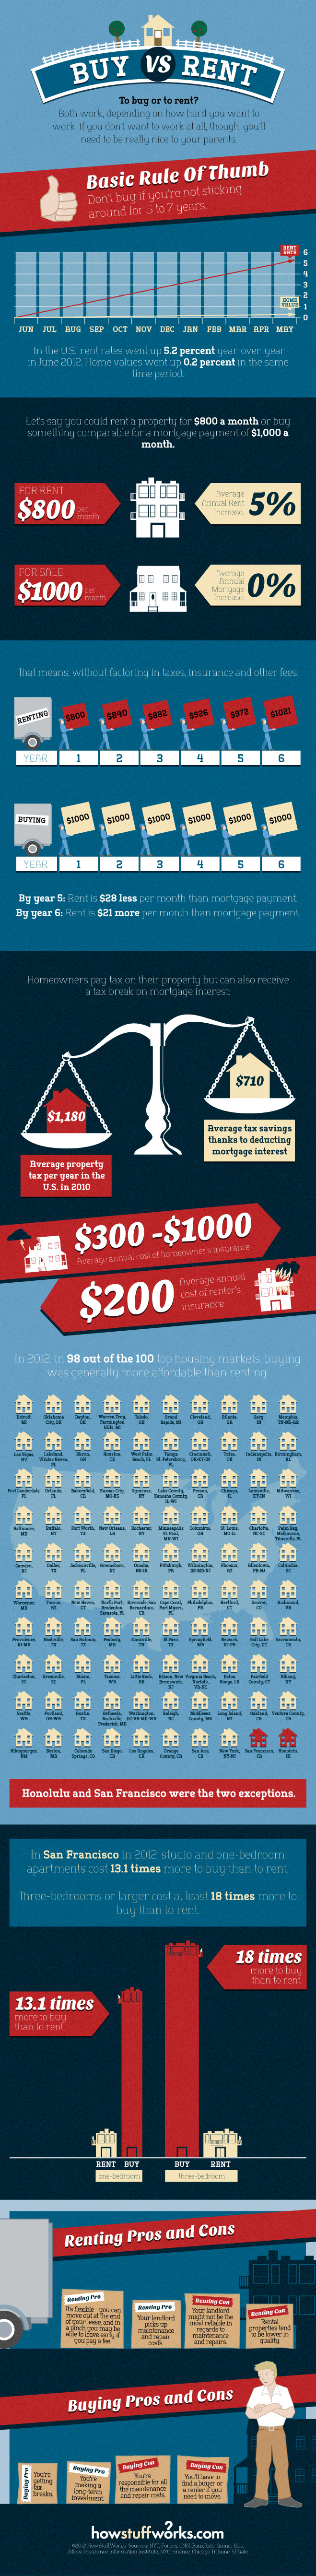 Infographic: Buy vs. Rent